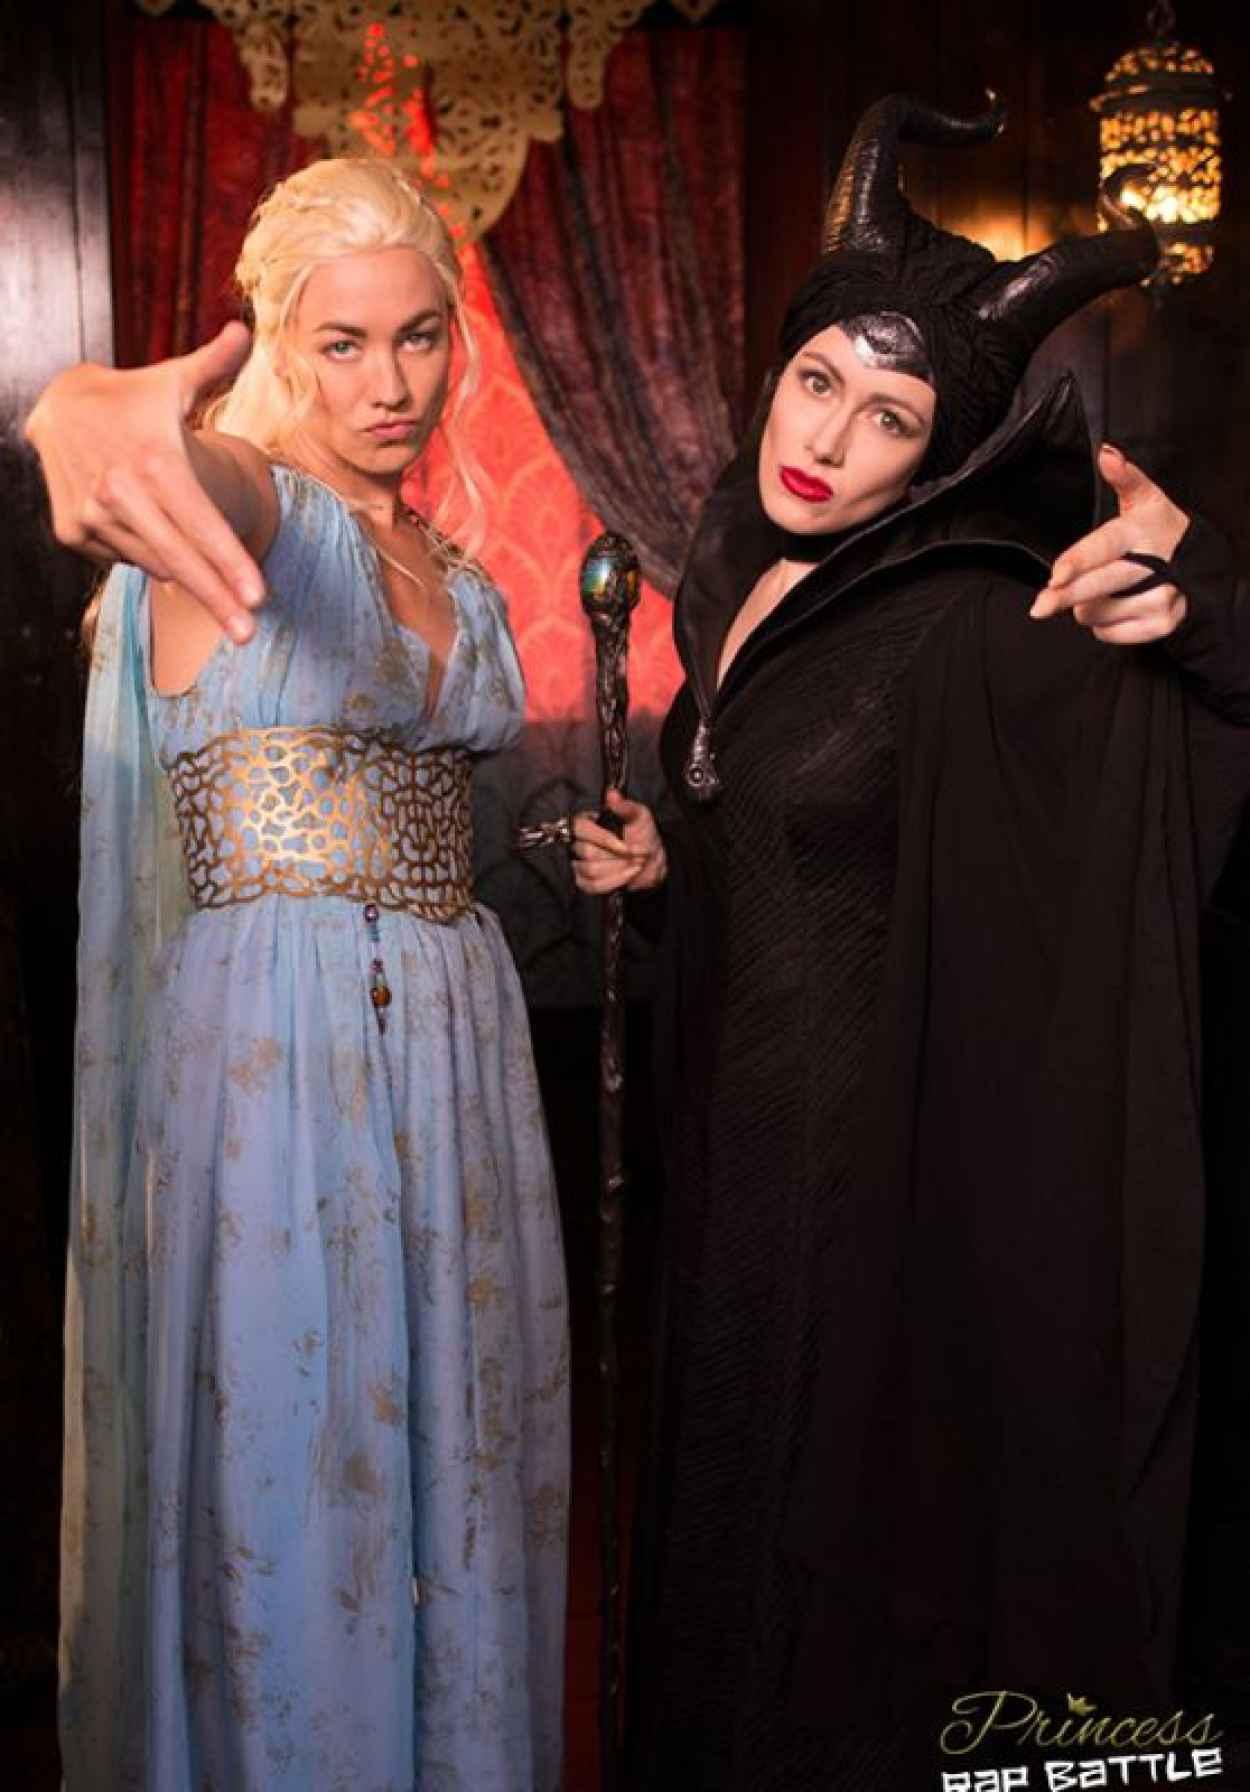 Yvonne Strahovski - Photoshoot for Princess Rap Battle - 2015-1